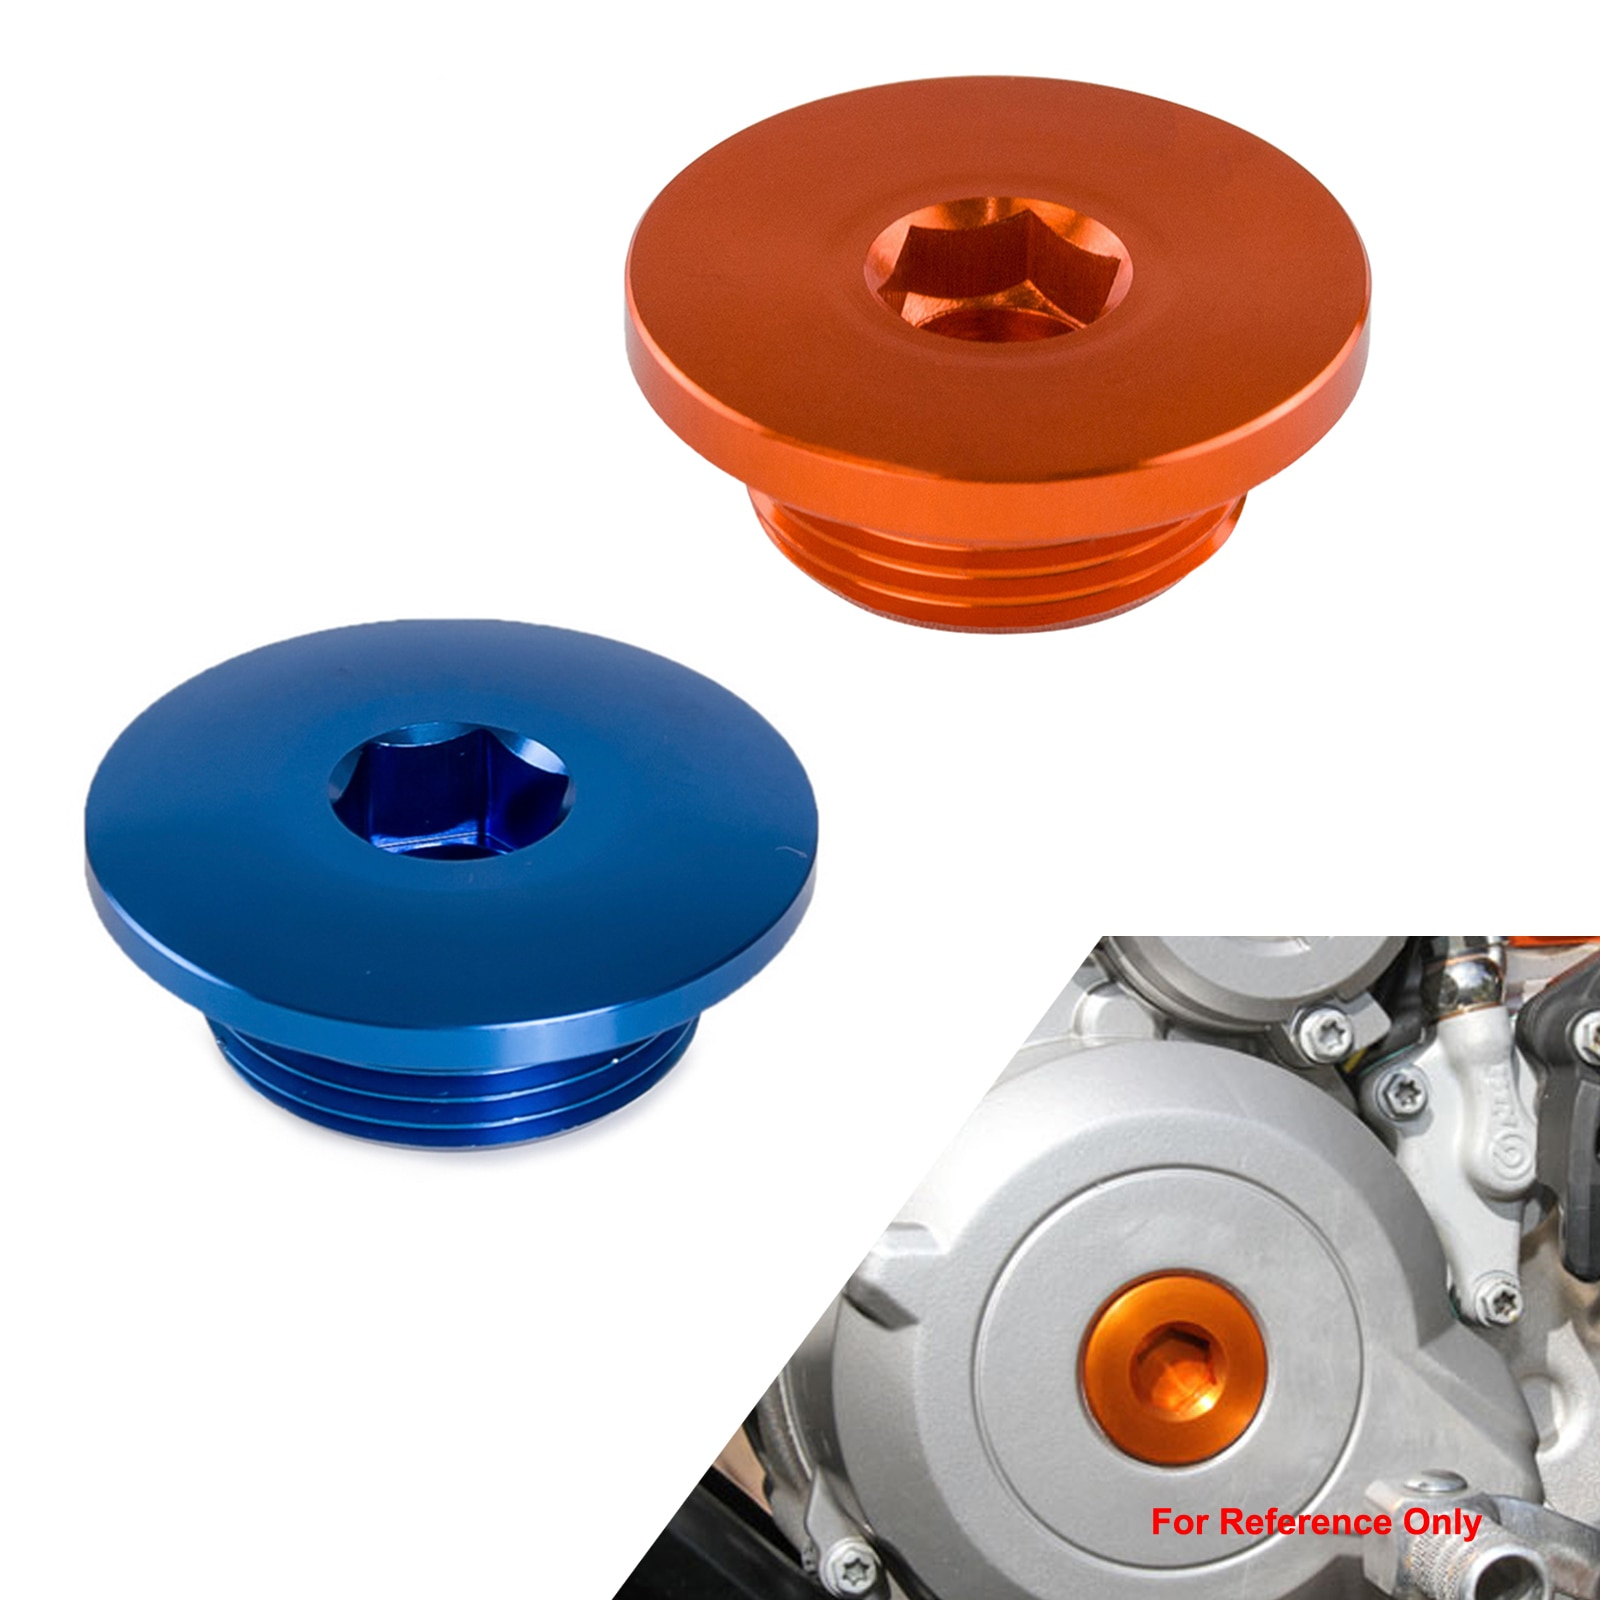 Заглушка зажигания двигателя для KTM 250 350 450 SXF XCF EXCF Duke 390 RC390 690 enuro SMC 990 950 1190 ADVENTURE 1290 SUPER DUKE